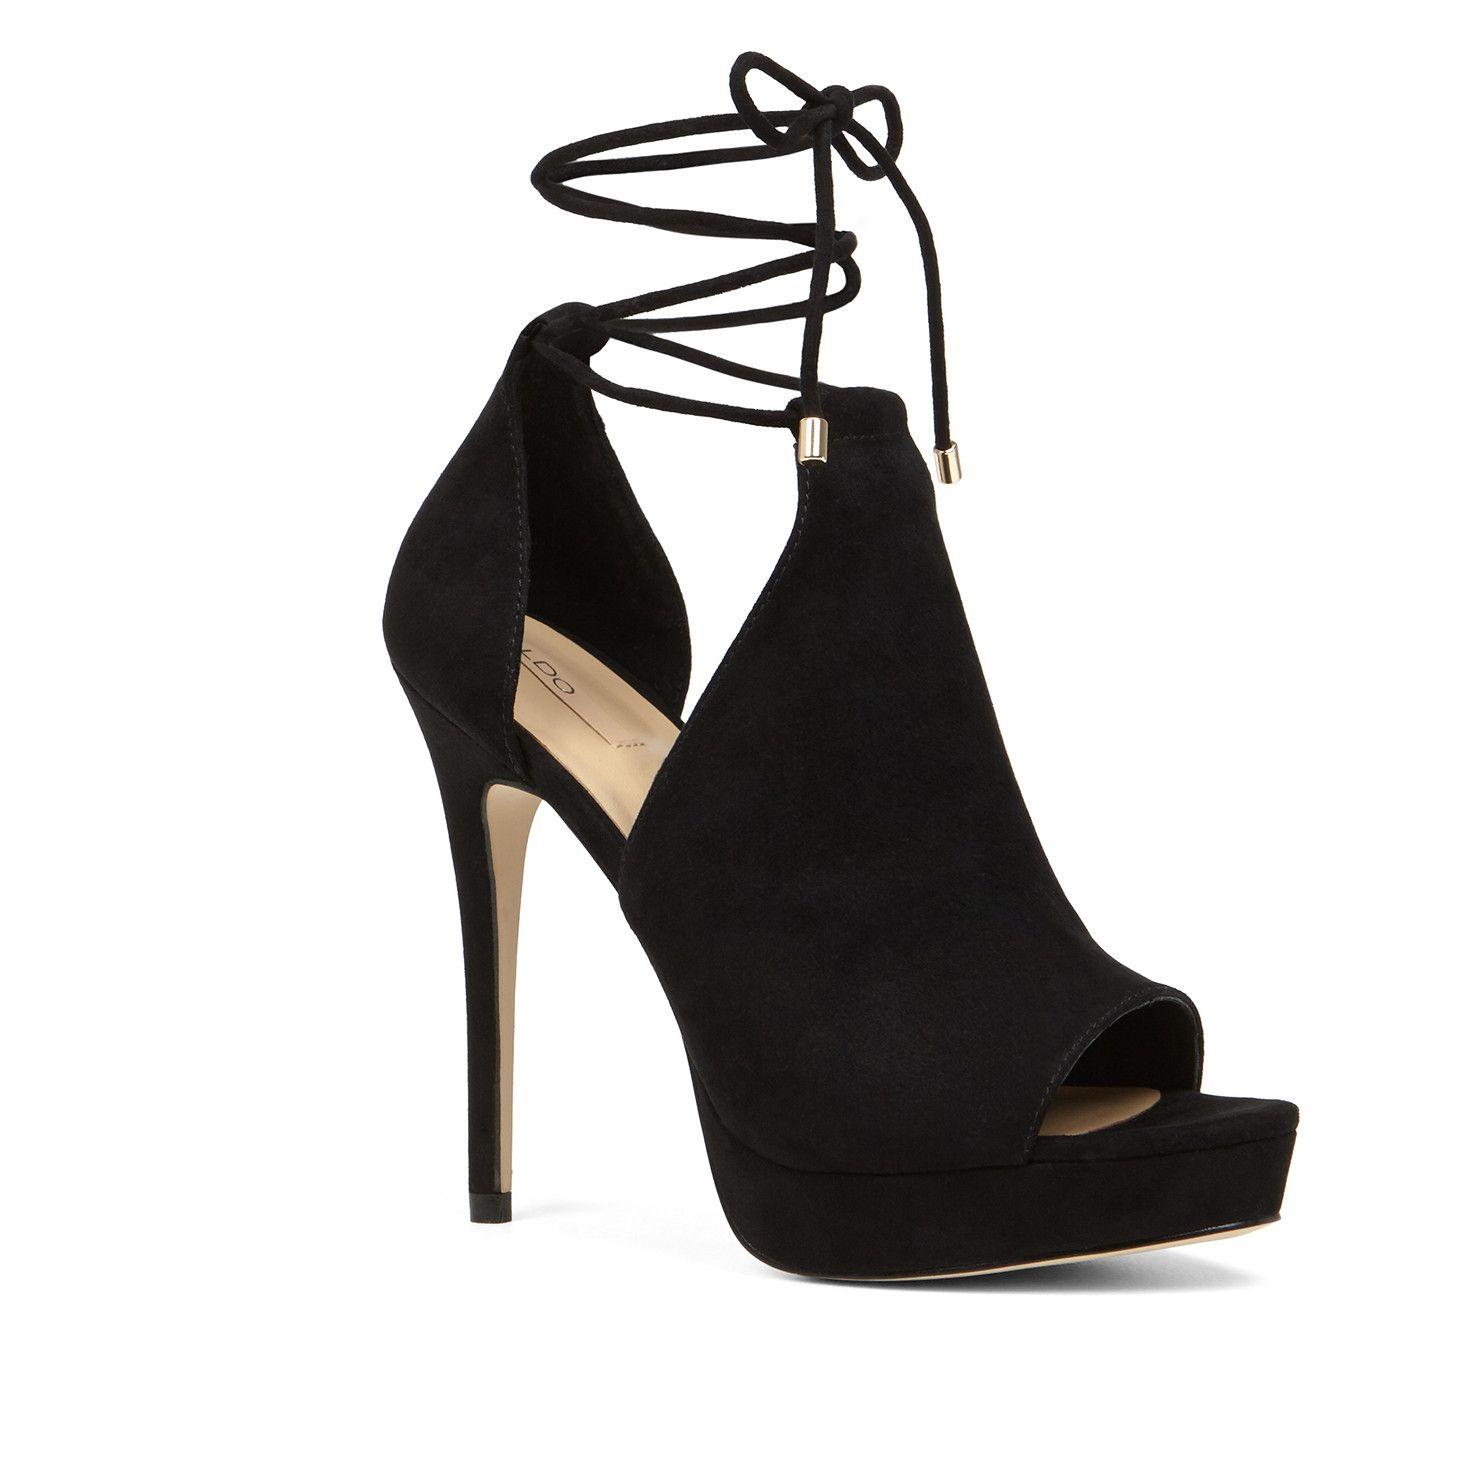 tilley high heel sandals s sandals aldoshoes